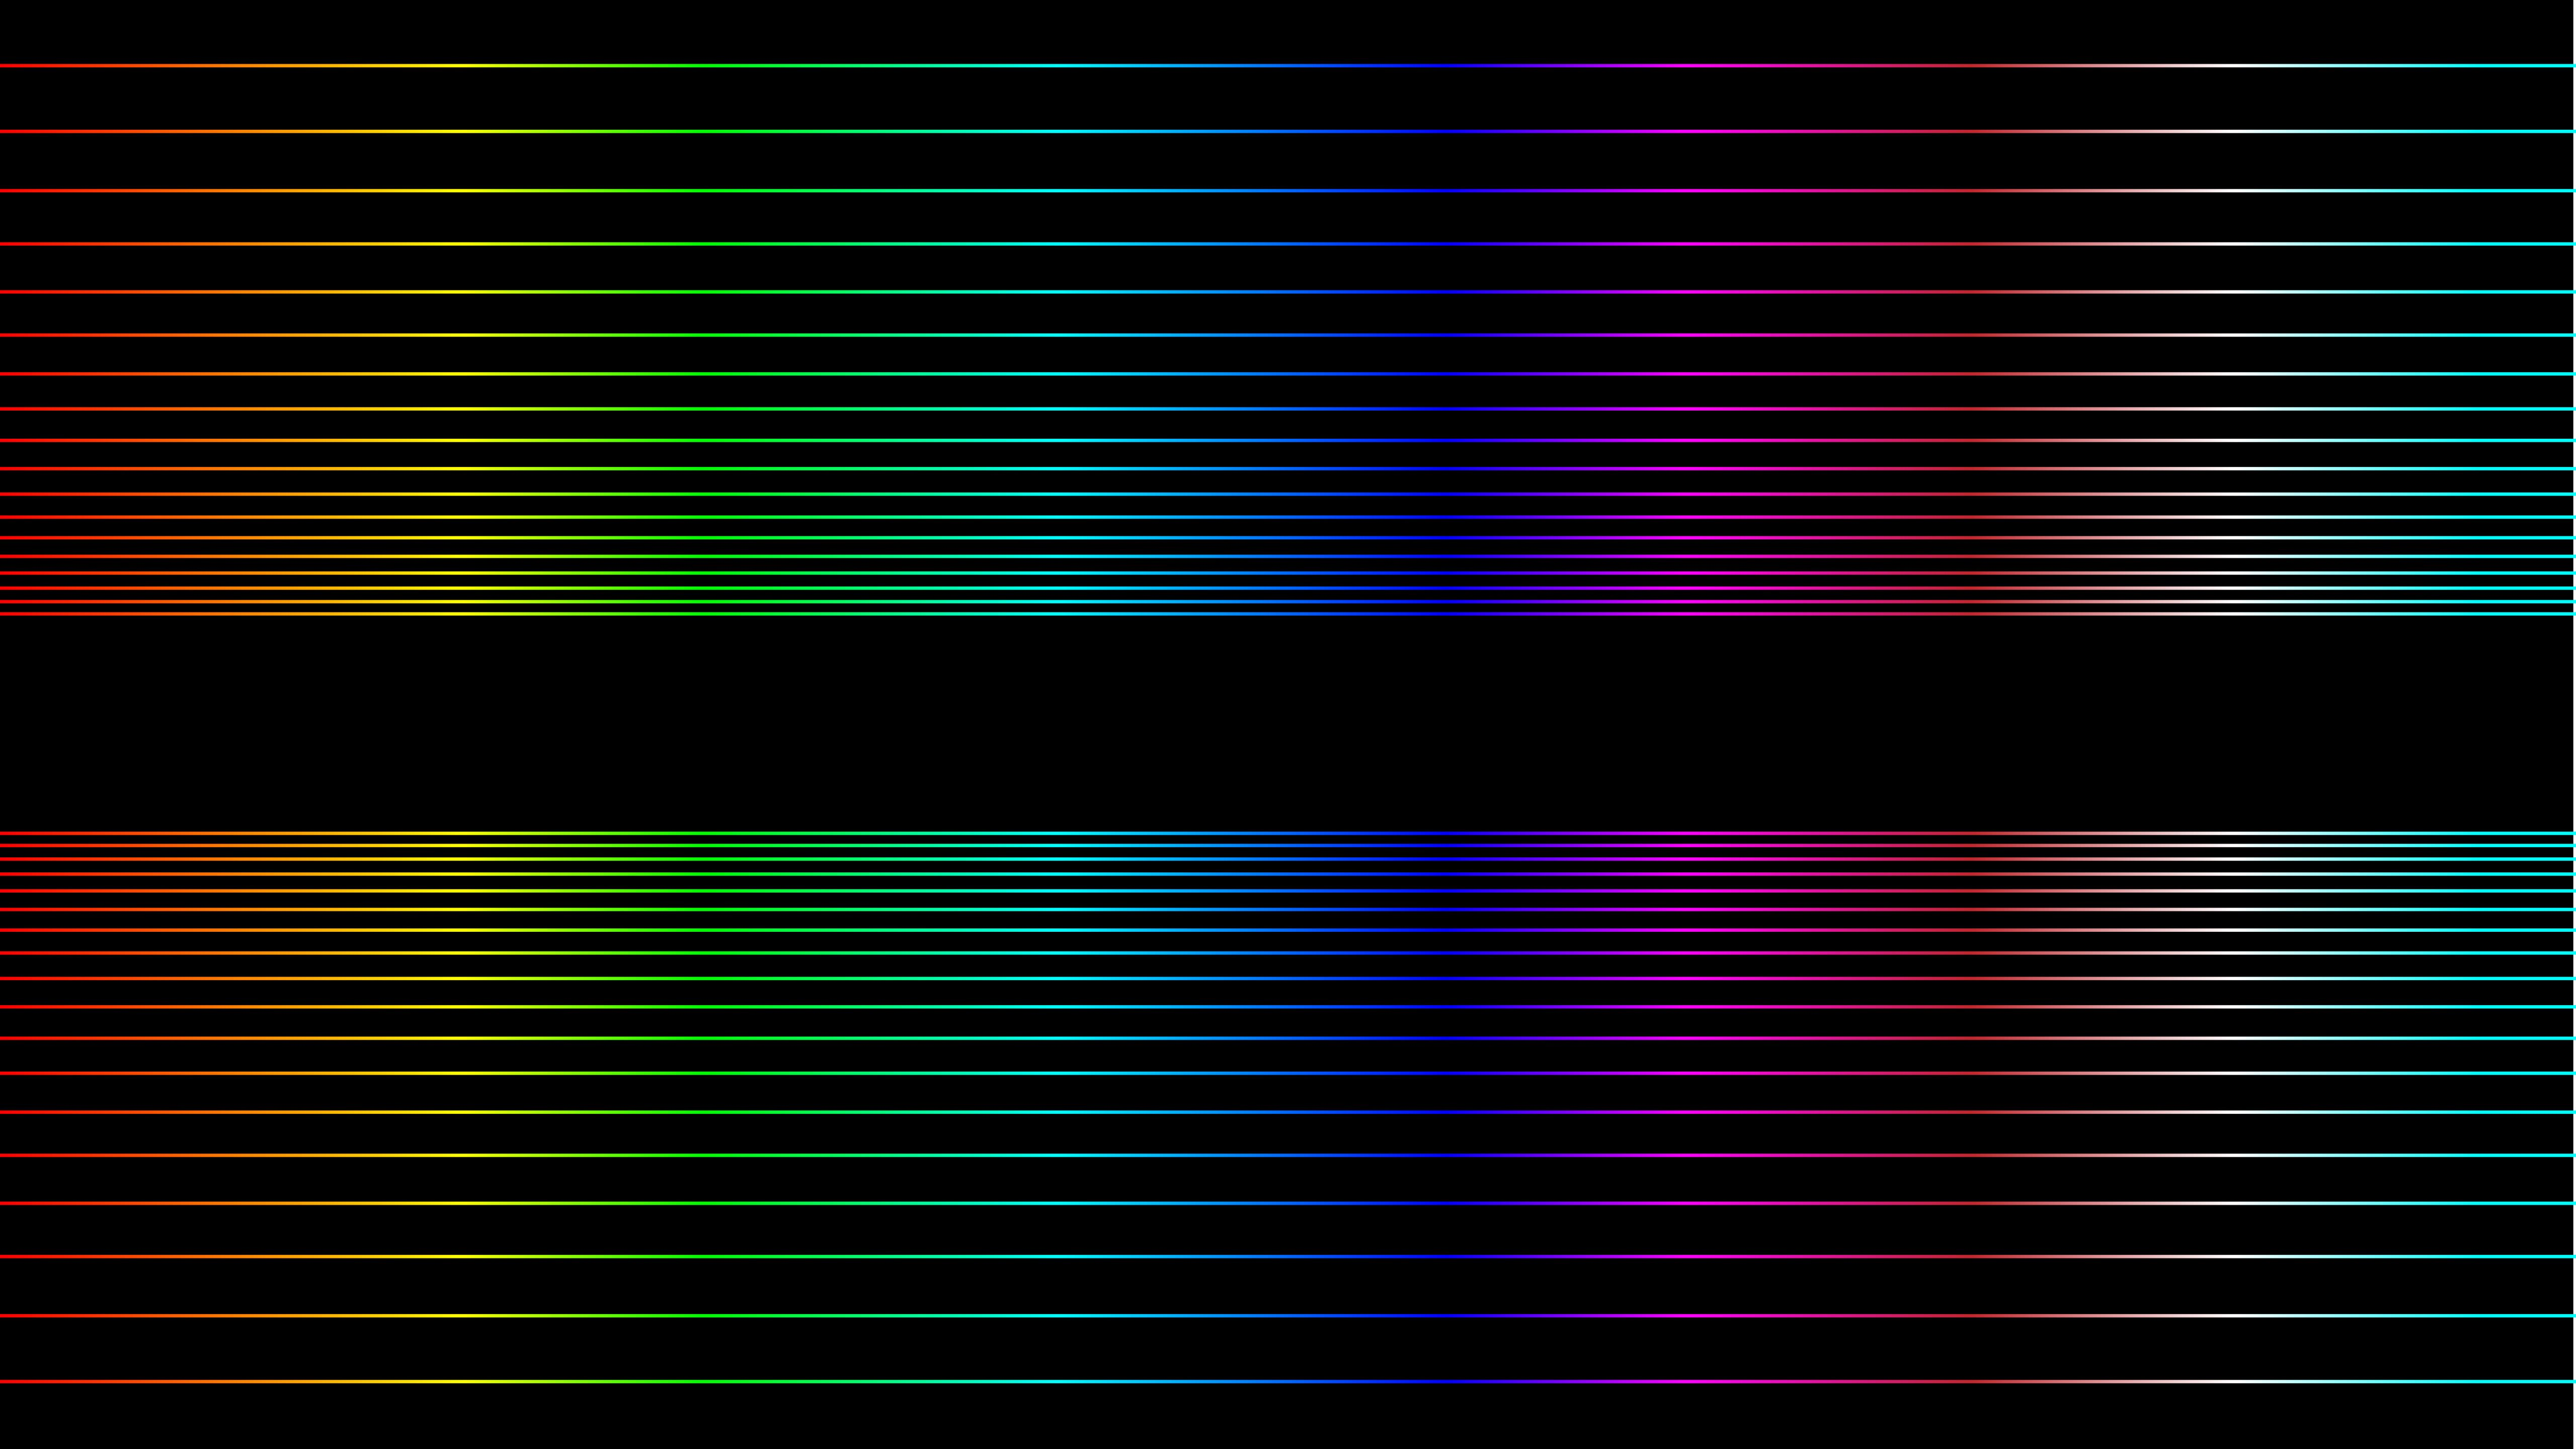 Retro Wave Gradient Lines 8k Macbook Air Wallpaper Download Allmacwallpaper